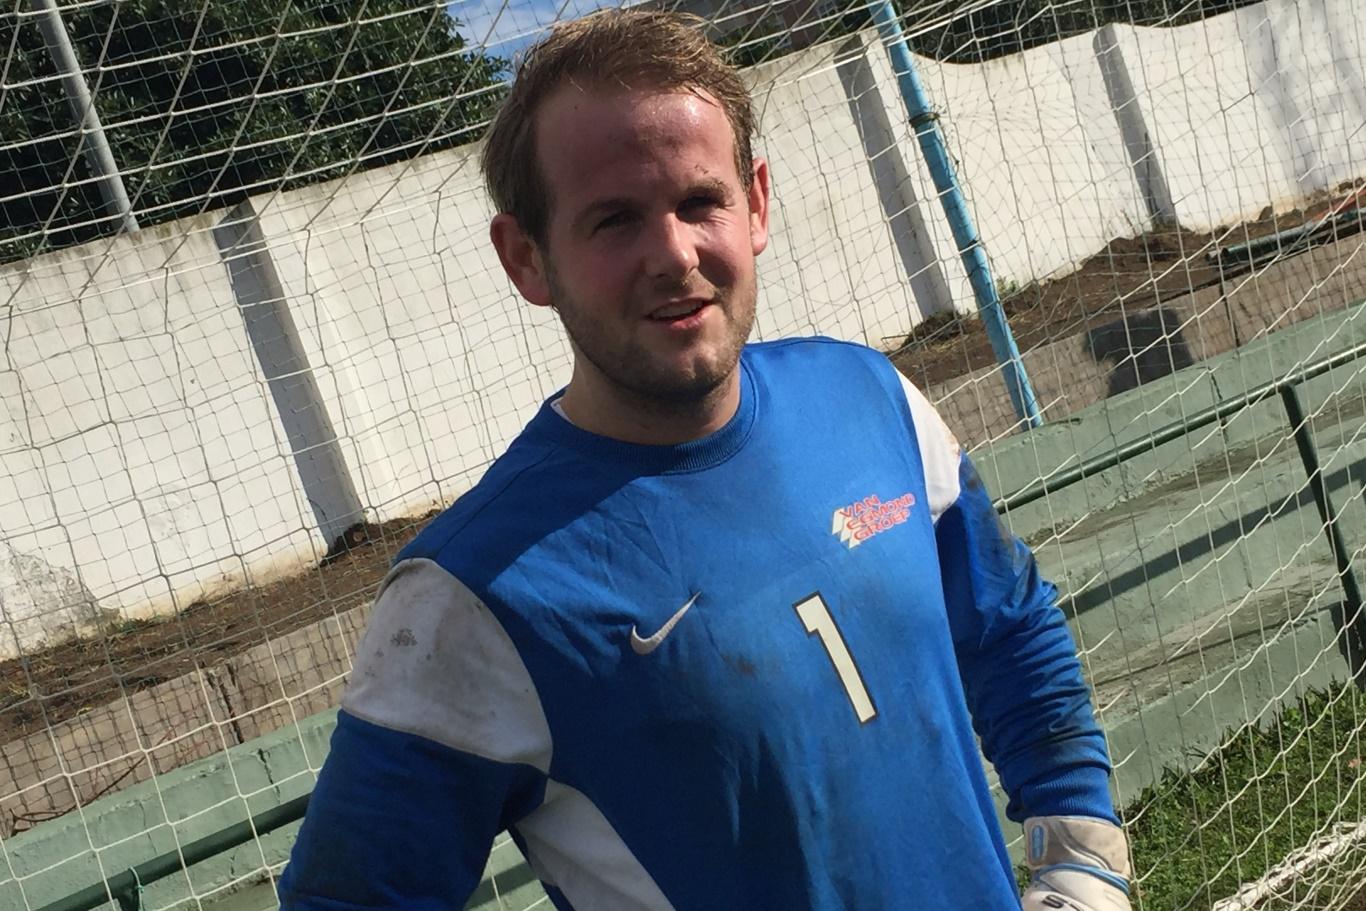 Marco Olthuis Sportclub Silvolde Malaga Excelsior Maassluis